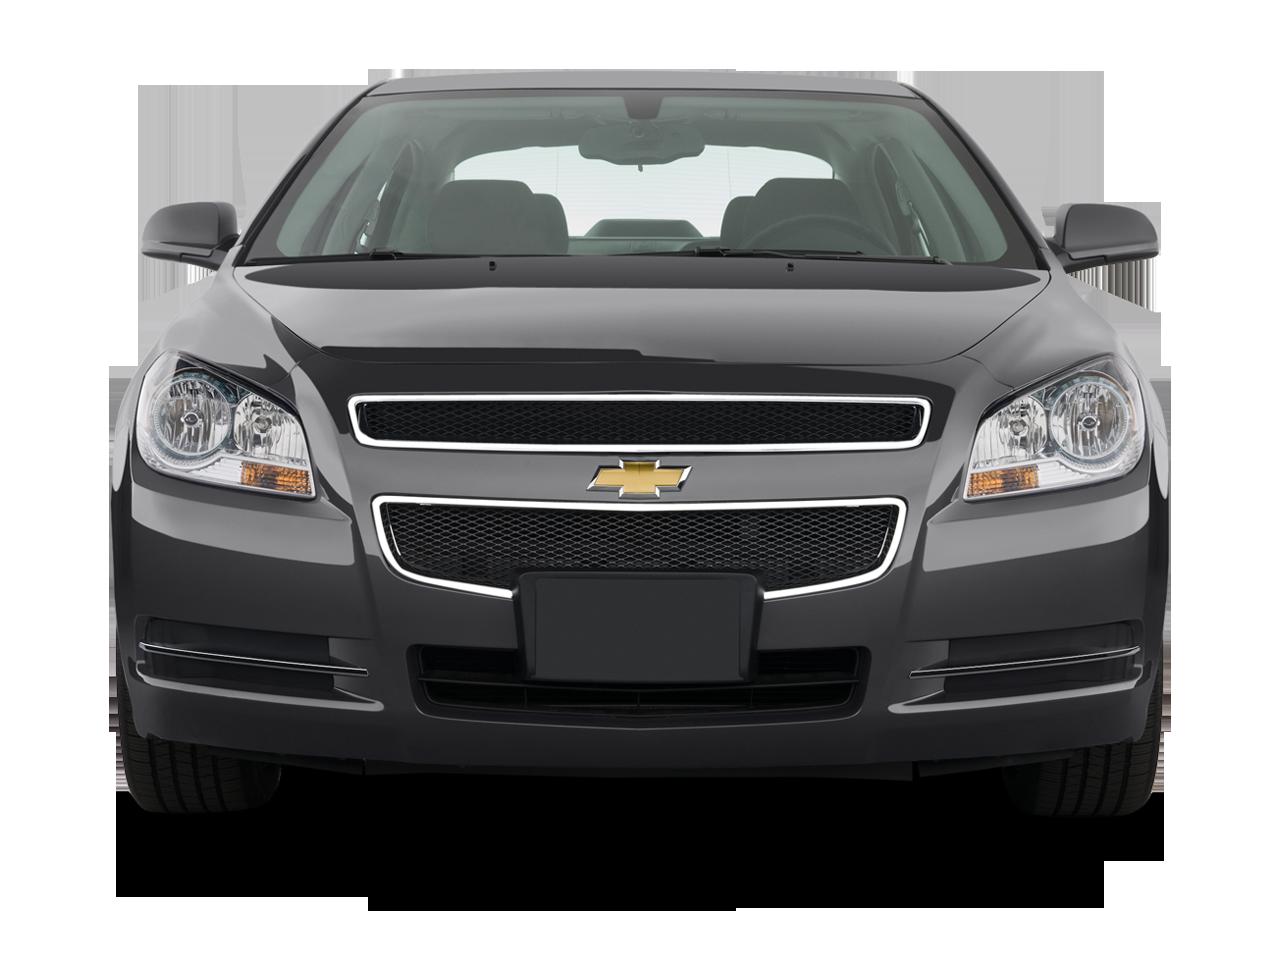 2008 chevy malibu hybrid chevrolet hybrid sedan review automobile magazine. Black Bedroom Furniture Sets. Home Design Ideas